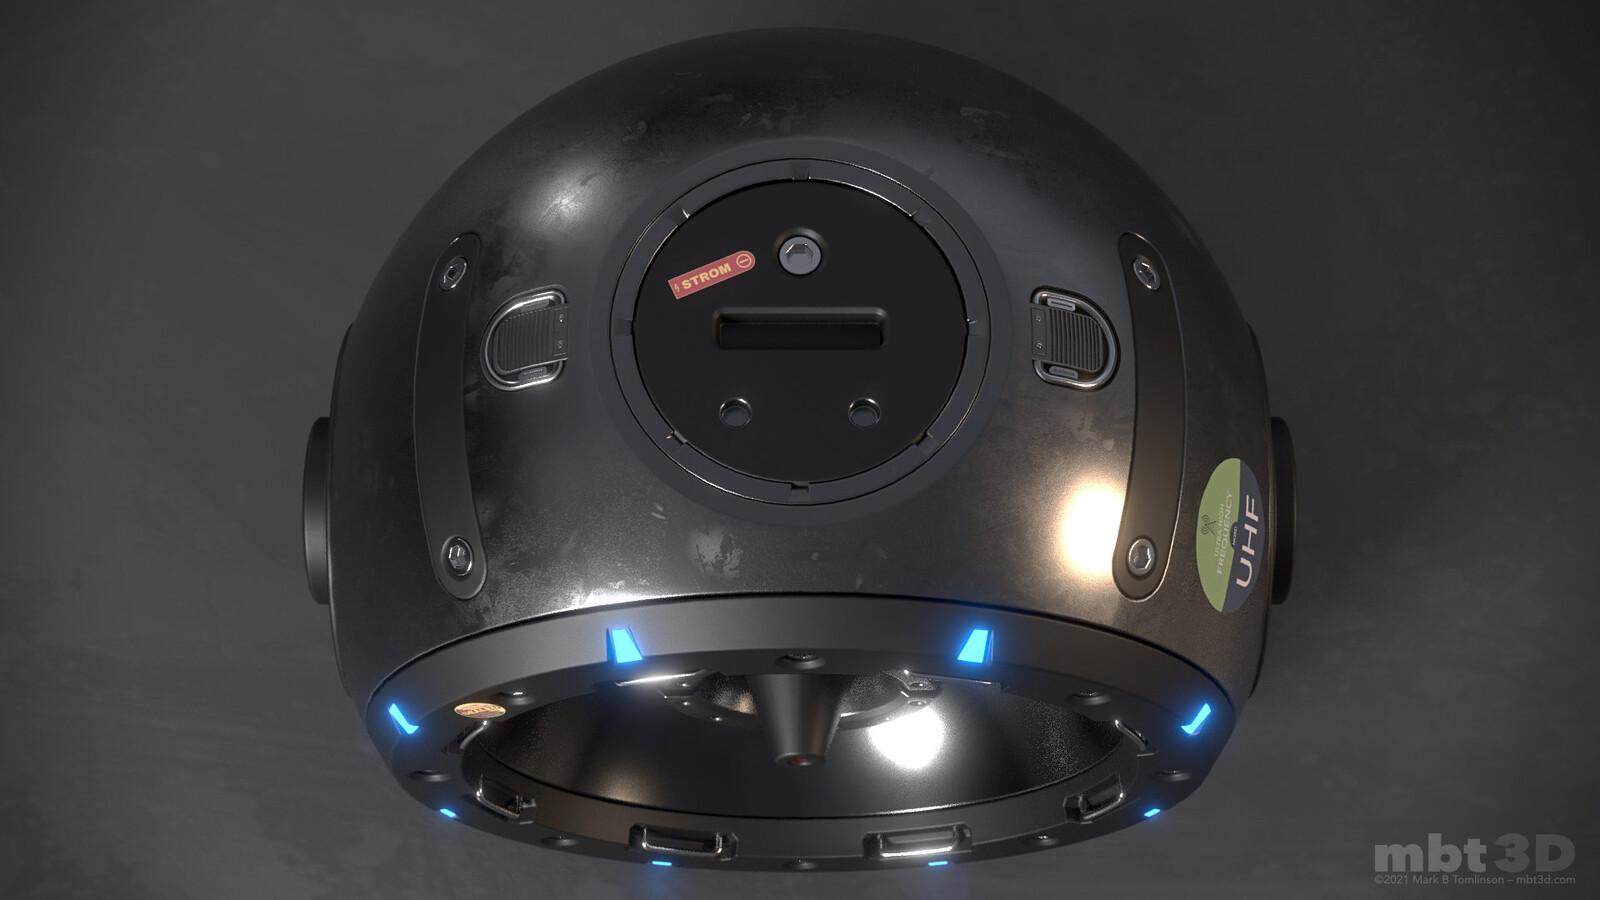 Spherical One: